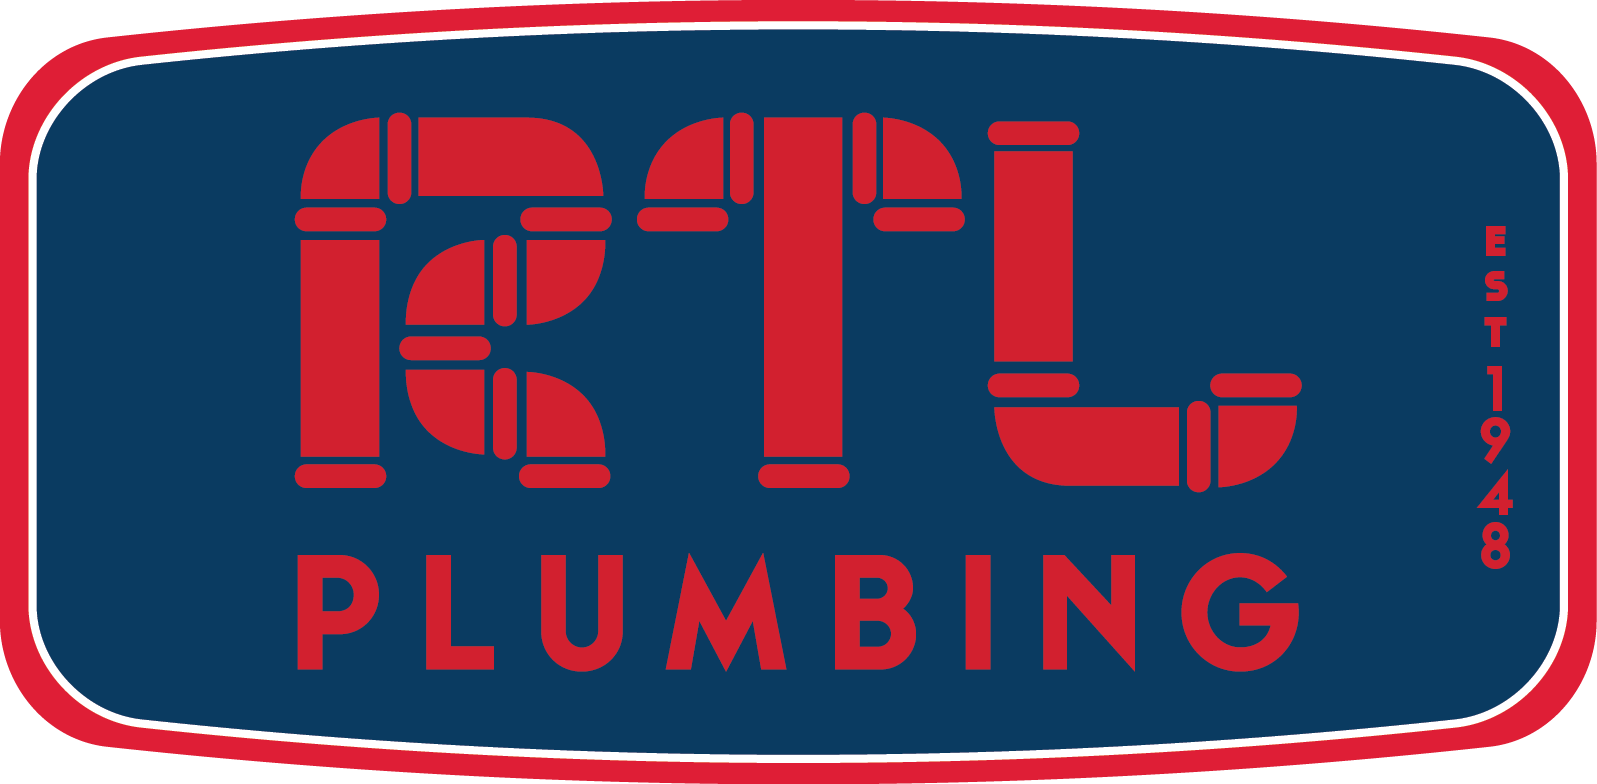 Rtl Plumbing Smart Strata Body Corporate Management